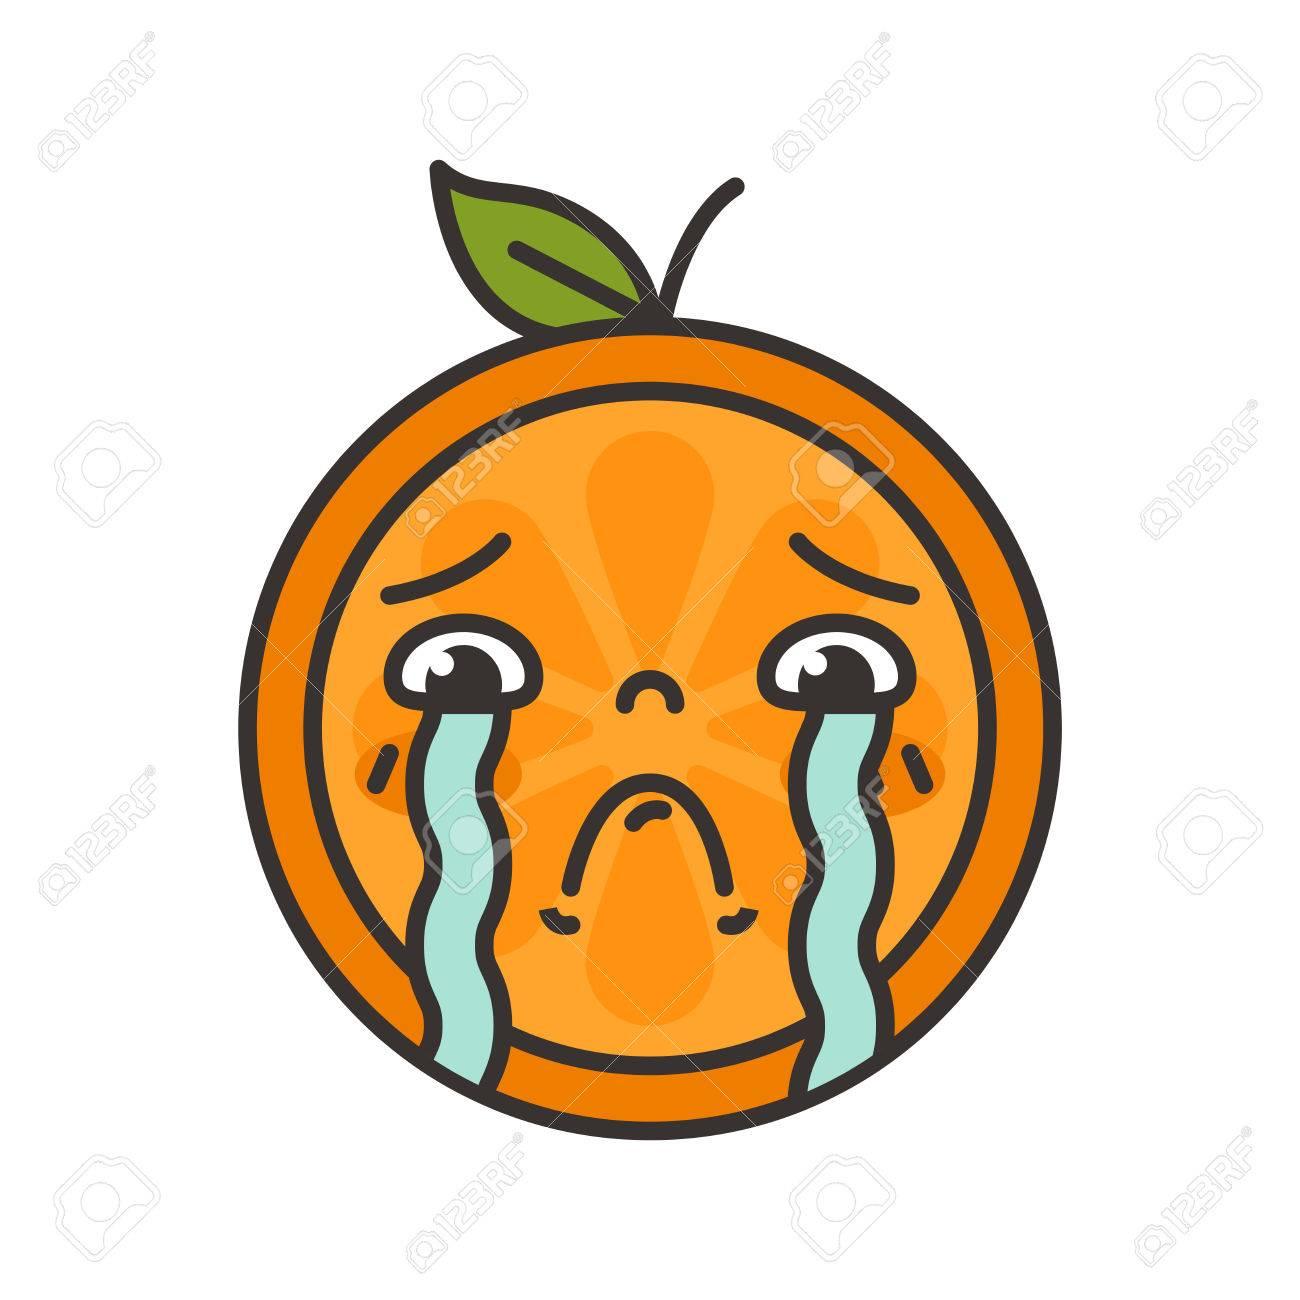 Tears Crying Emoji Orange Fruit With Vector Flat Design Emoticon Icon